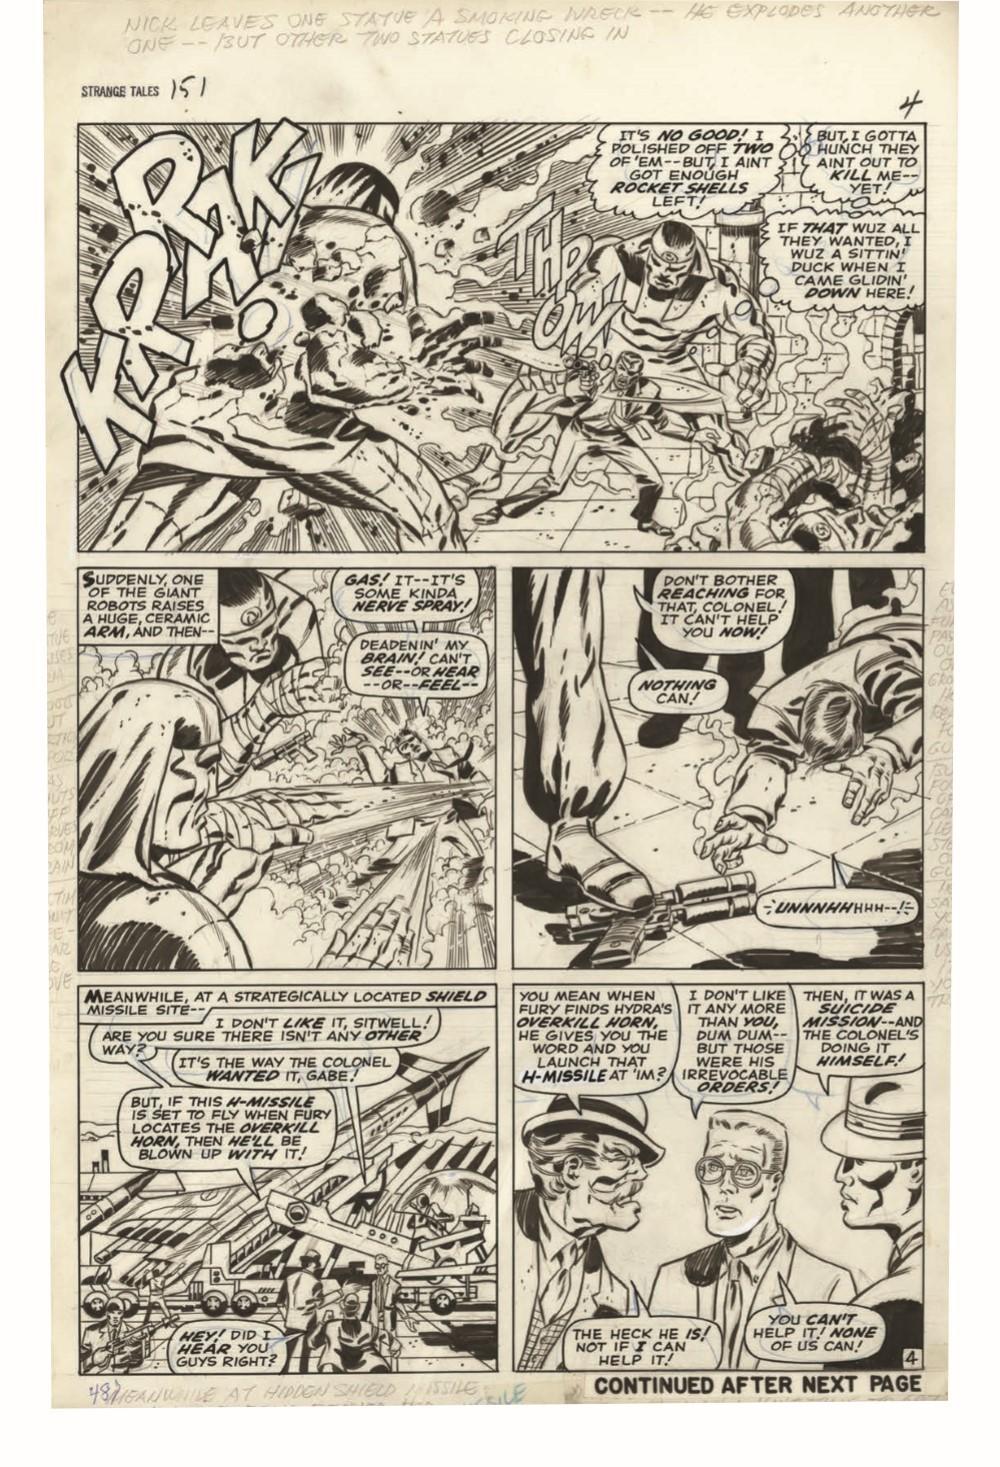 STERANKO_artisan_edition_pr-7 ComicList Previews: JIM STERANKO'S NICK FURY AGENT OF S.H.I.E.L.D. ARTISAN EDITION TP